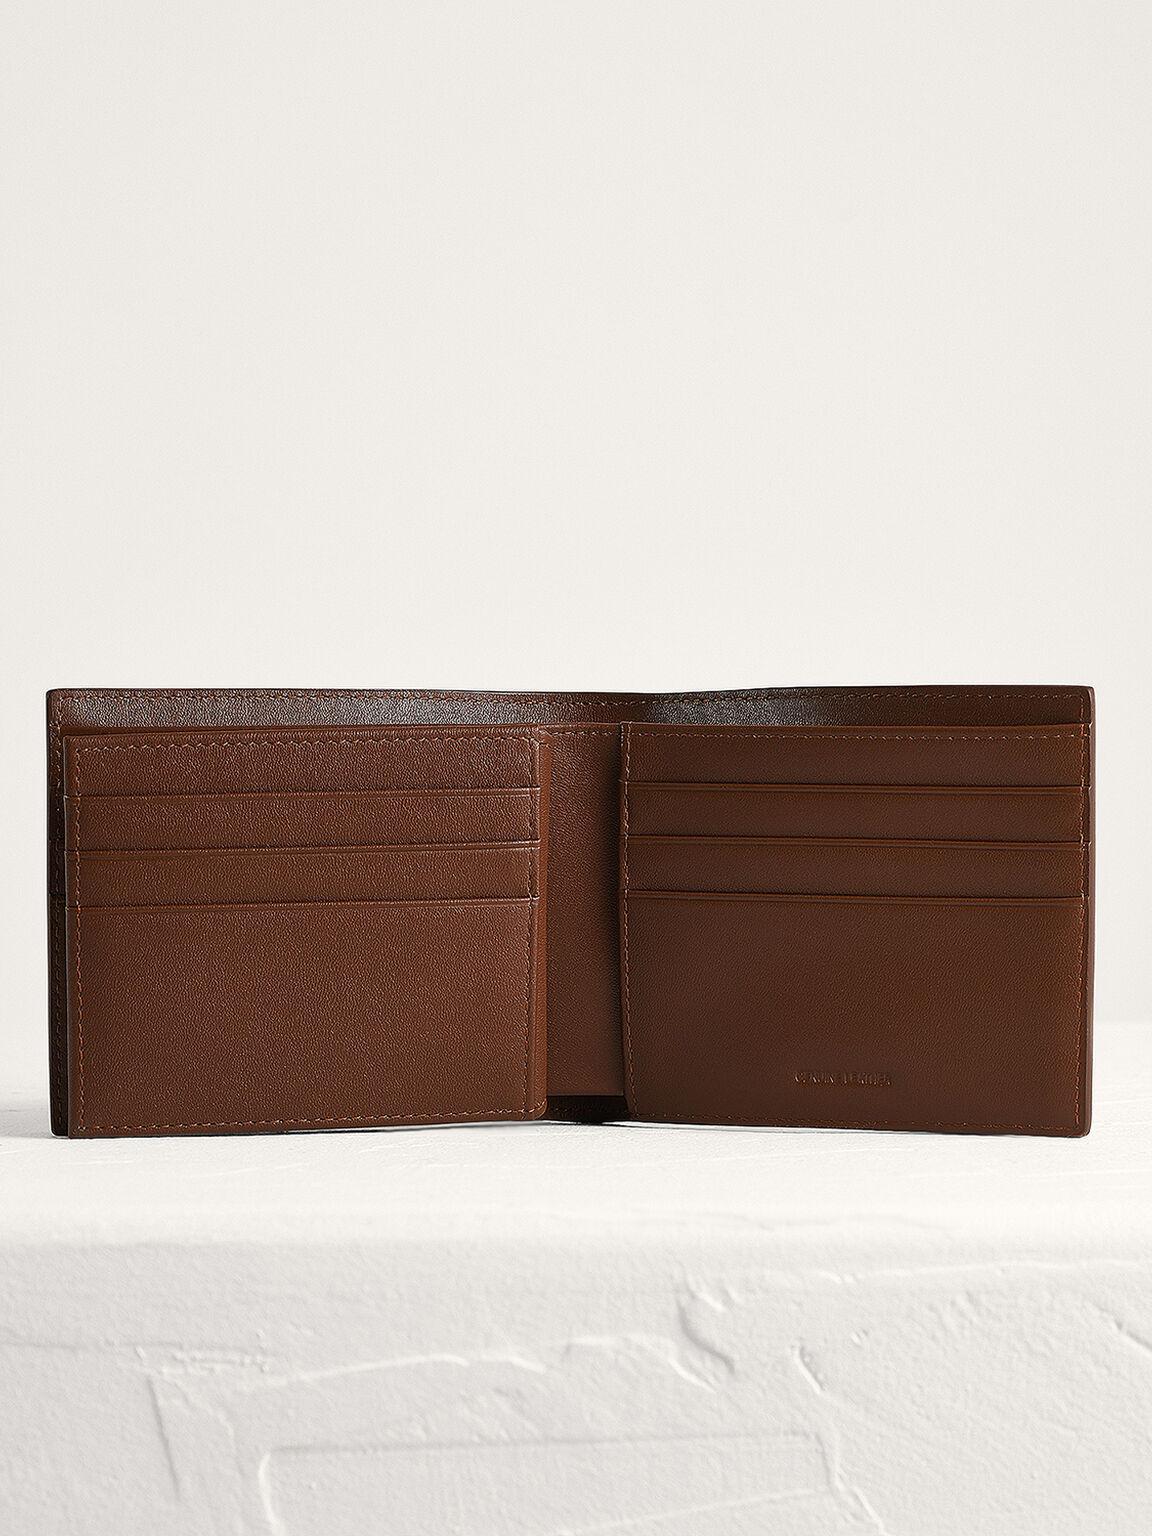 Leather Bi-Fold with Flip, Cognac, hi-res